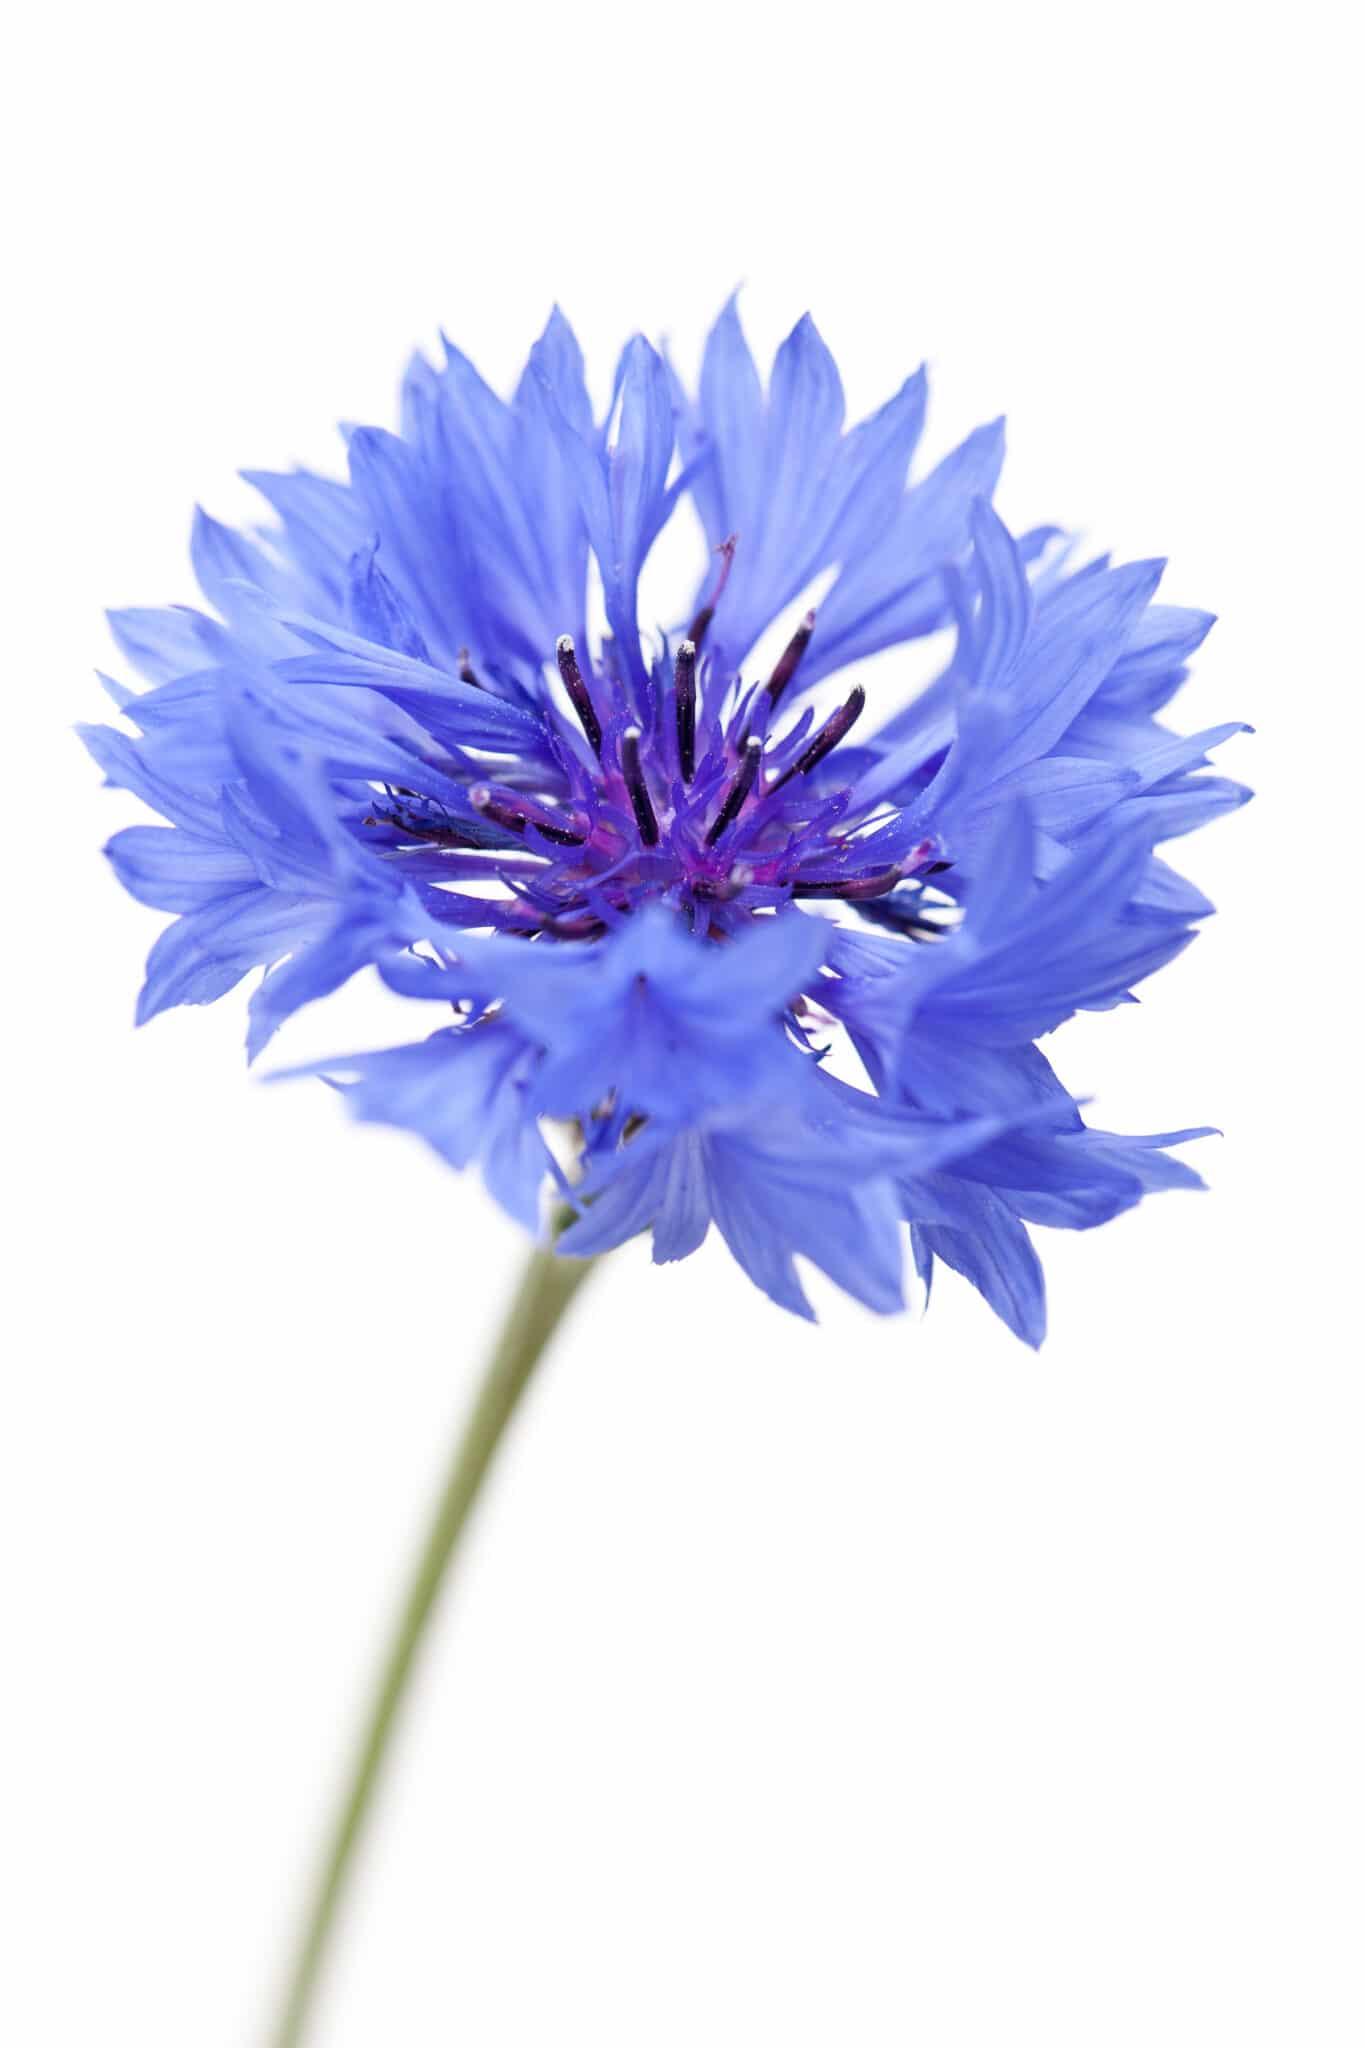 Eine hellblaue Junggesellenknopfblume.